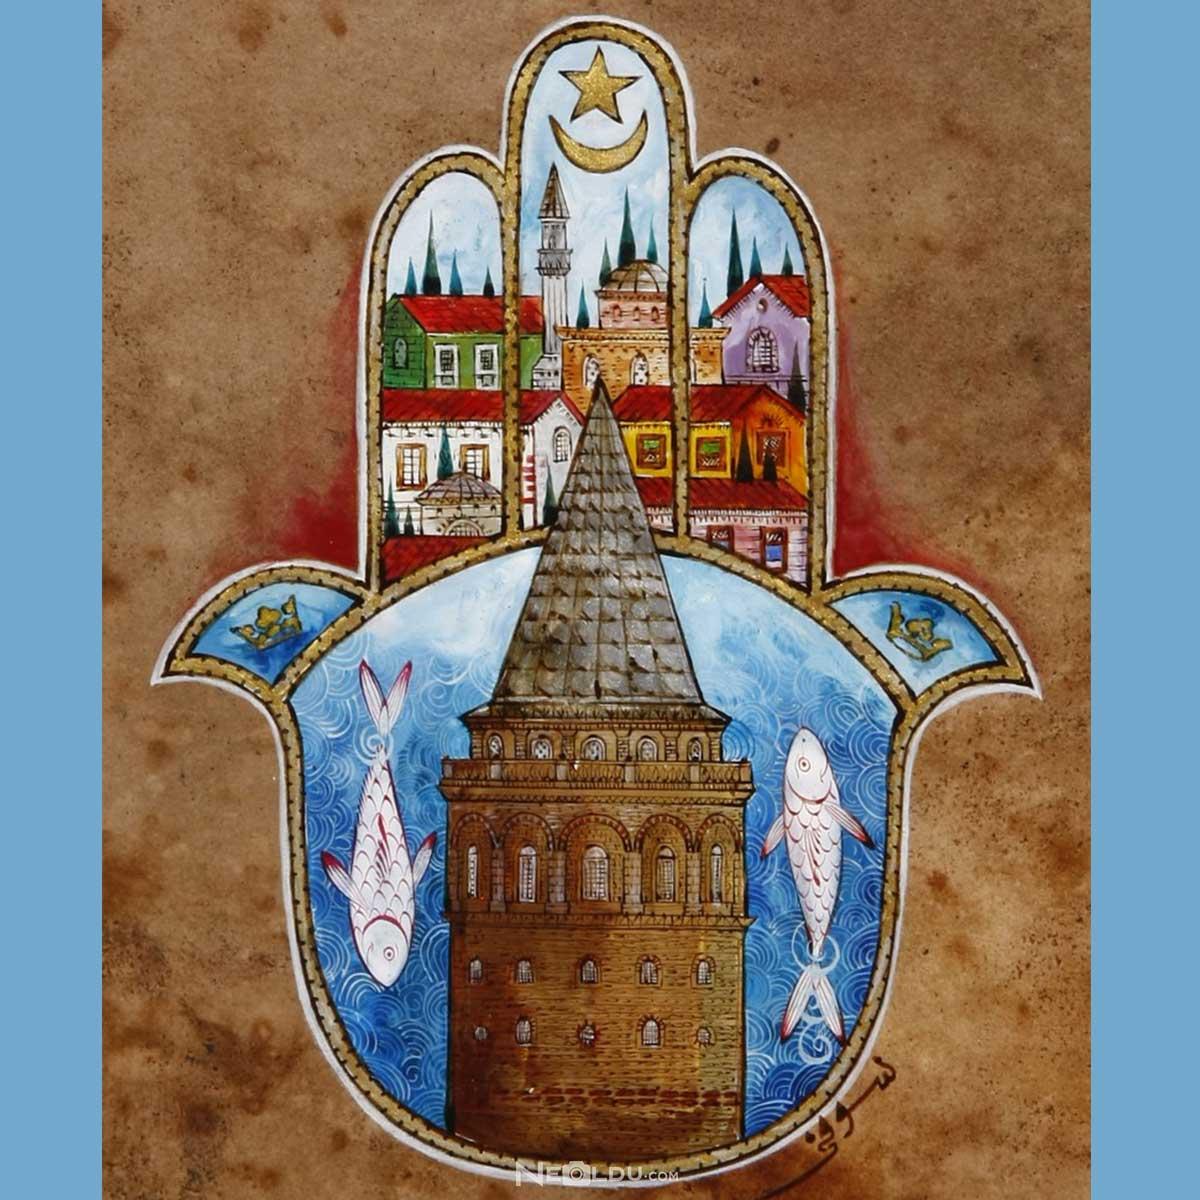 el sembolunun anlami nedir inanclara